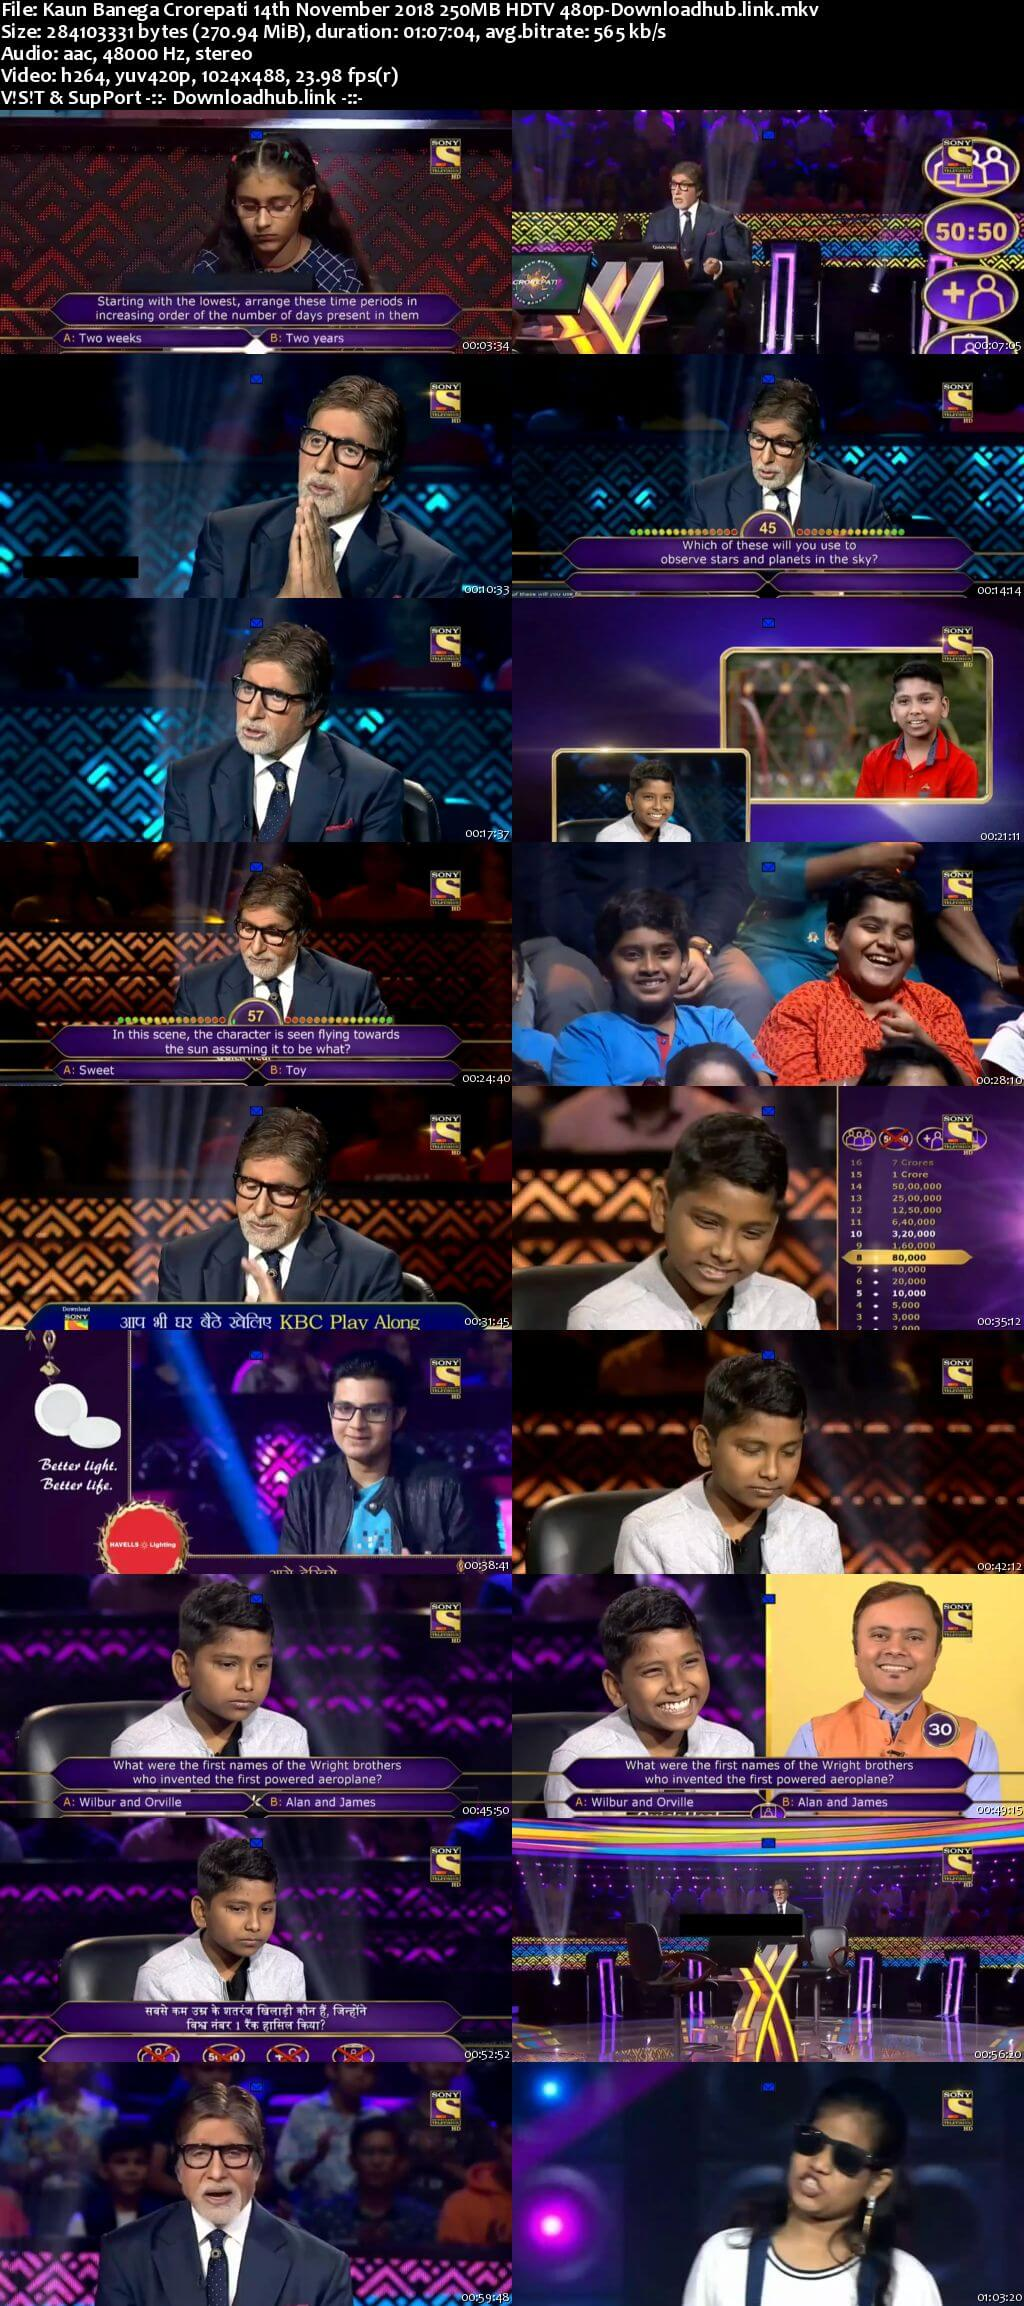 Kaun Banega Crorepati 14th November 2018 250MB HDTV 480p